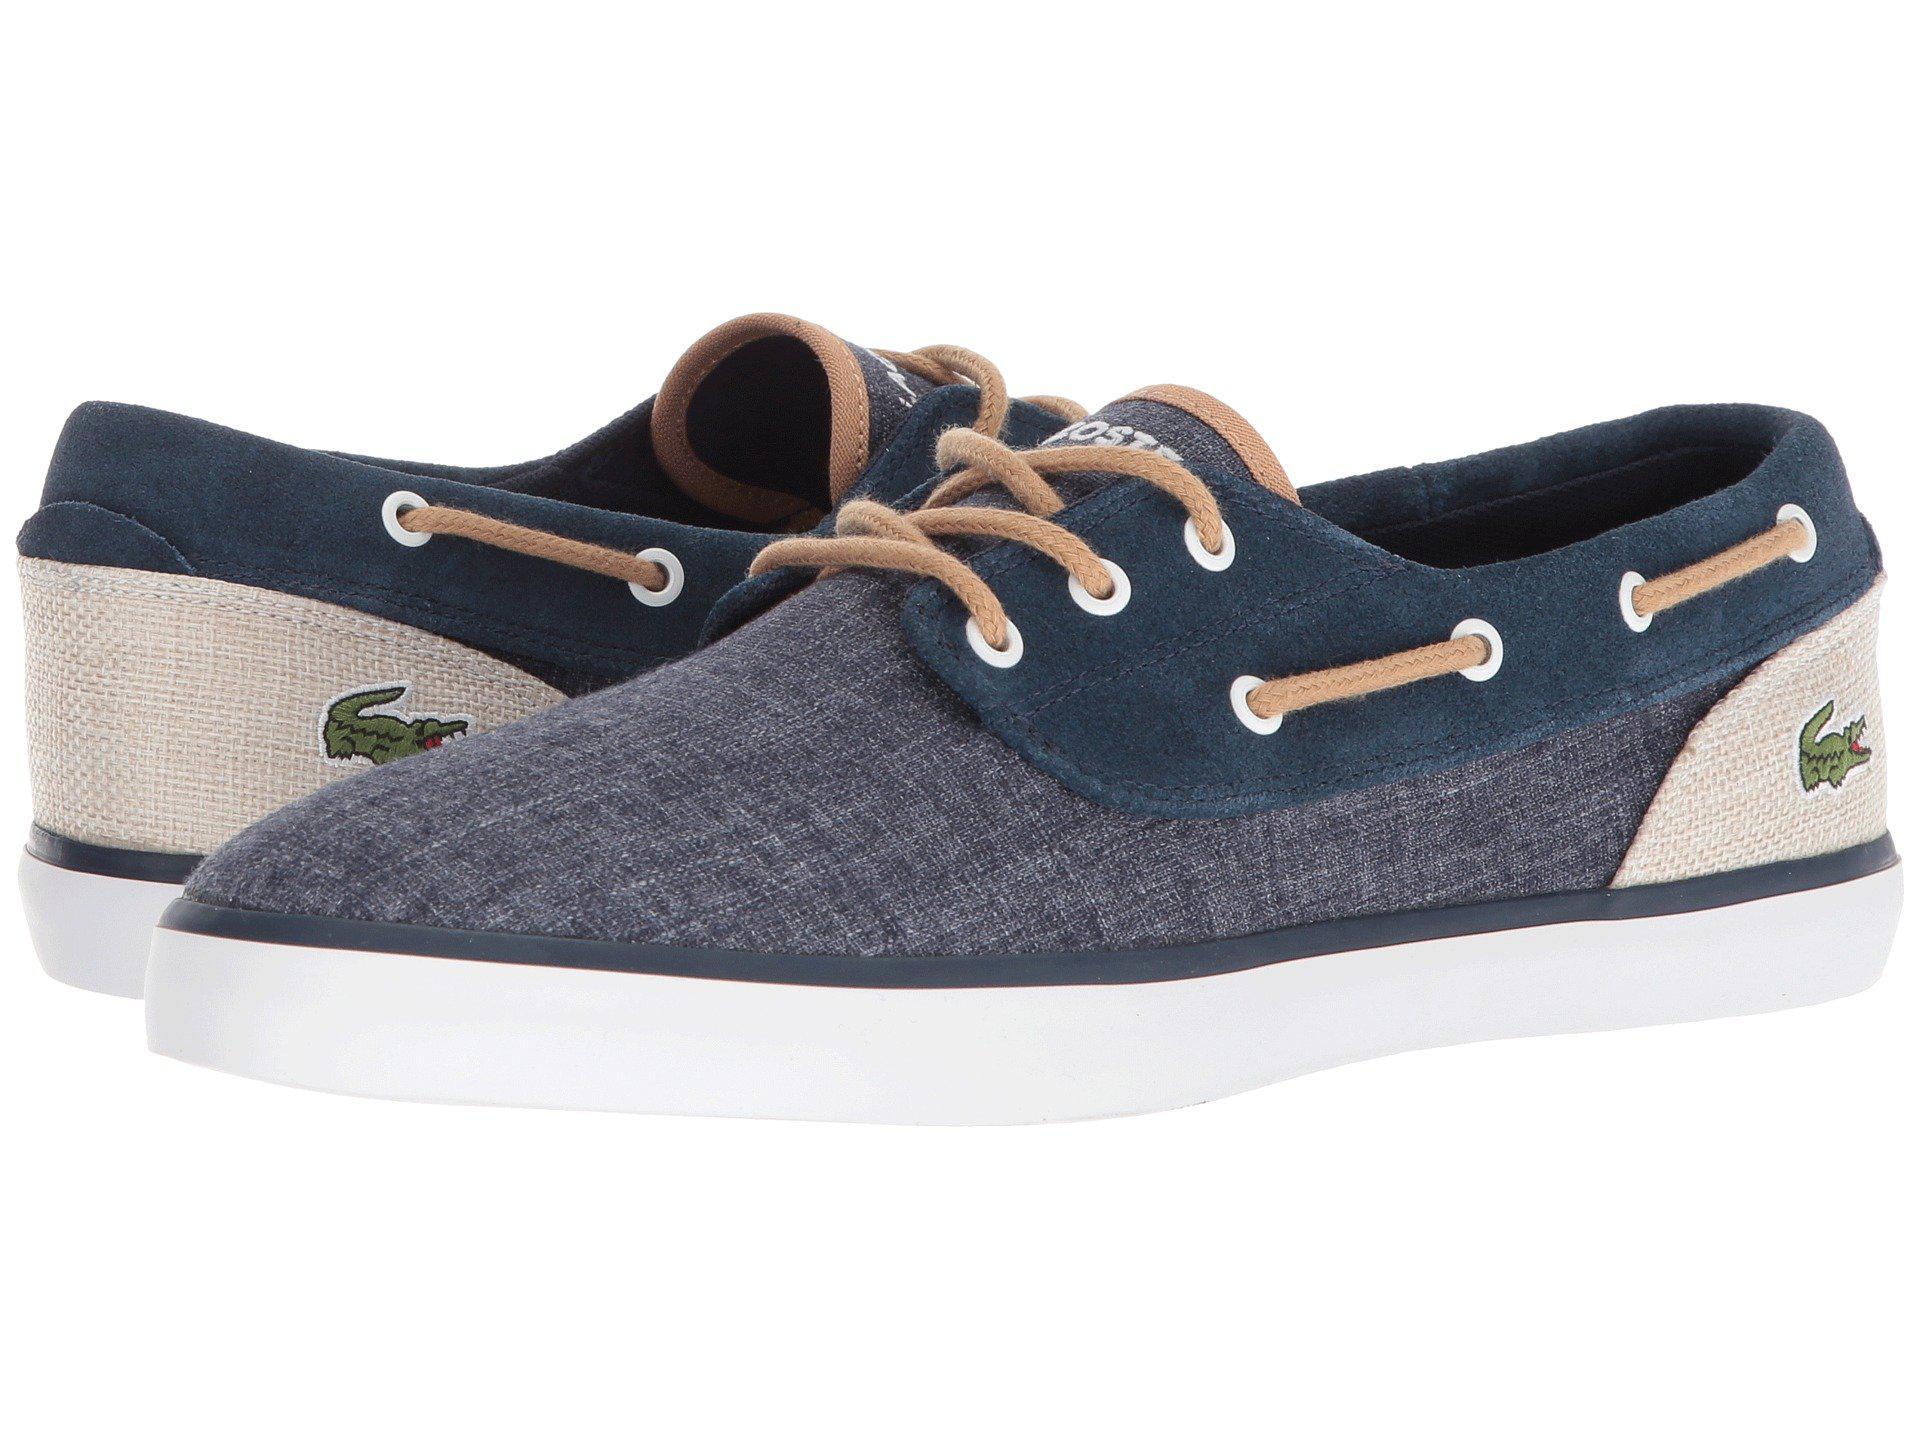 b8c176c5b Lyst - Lacoste Jouer Deck 218 1 (natural natural) Men s Shoes in ...